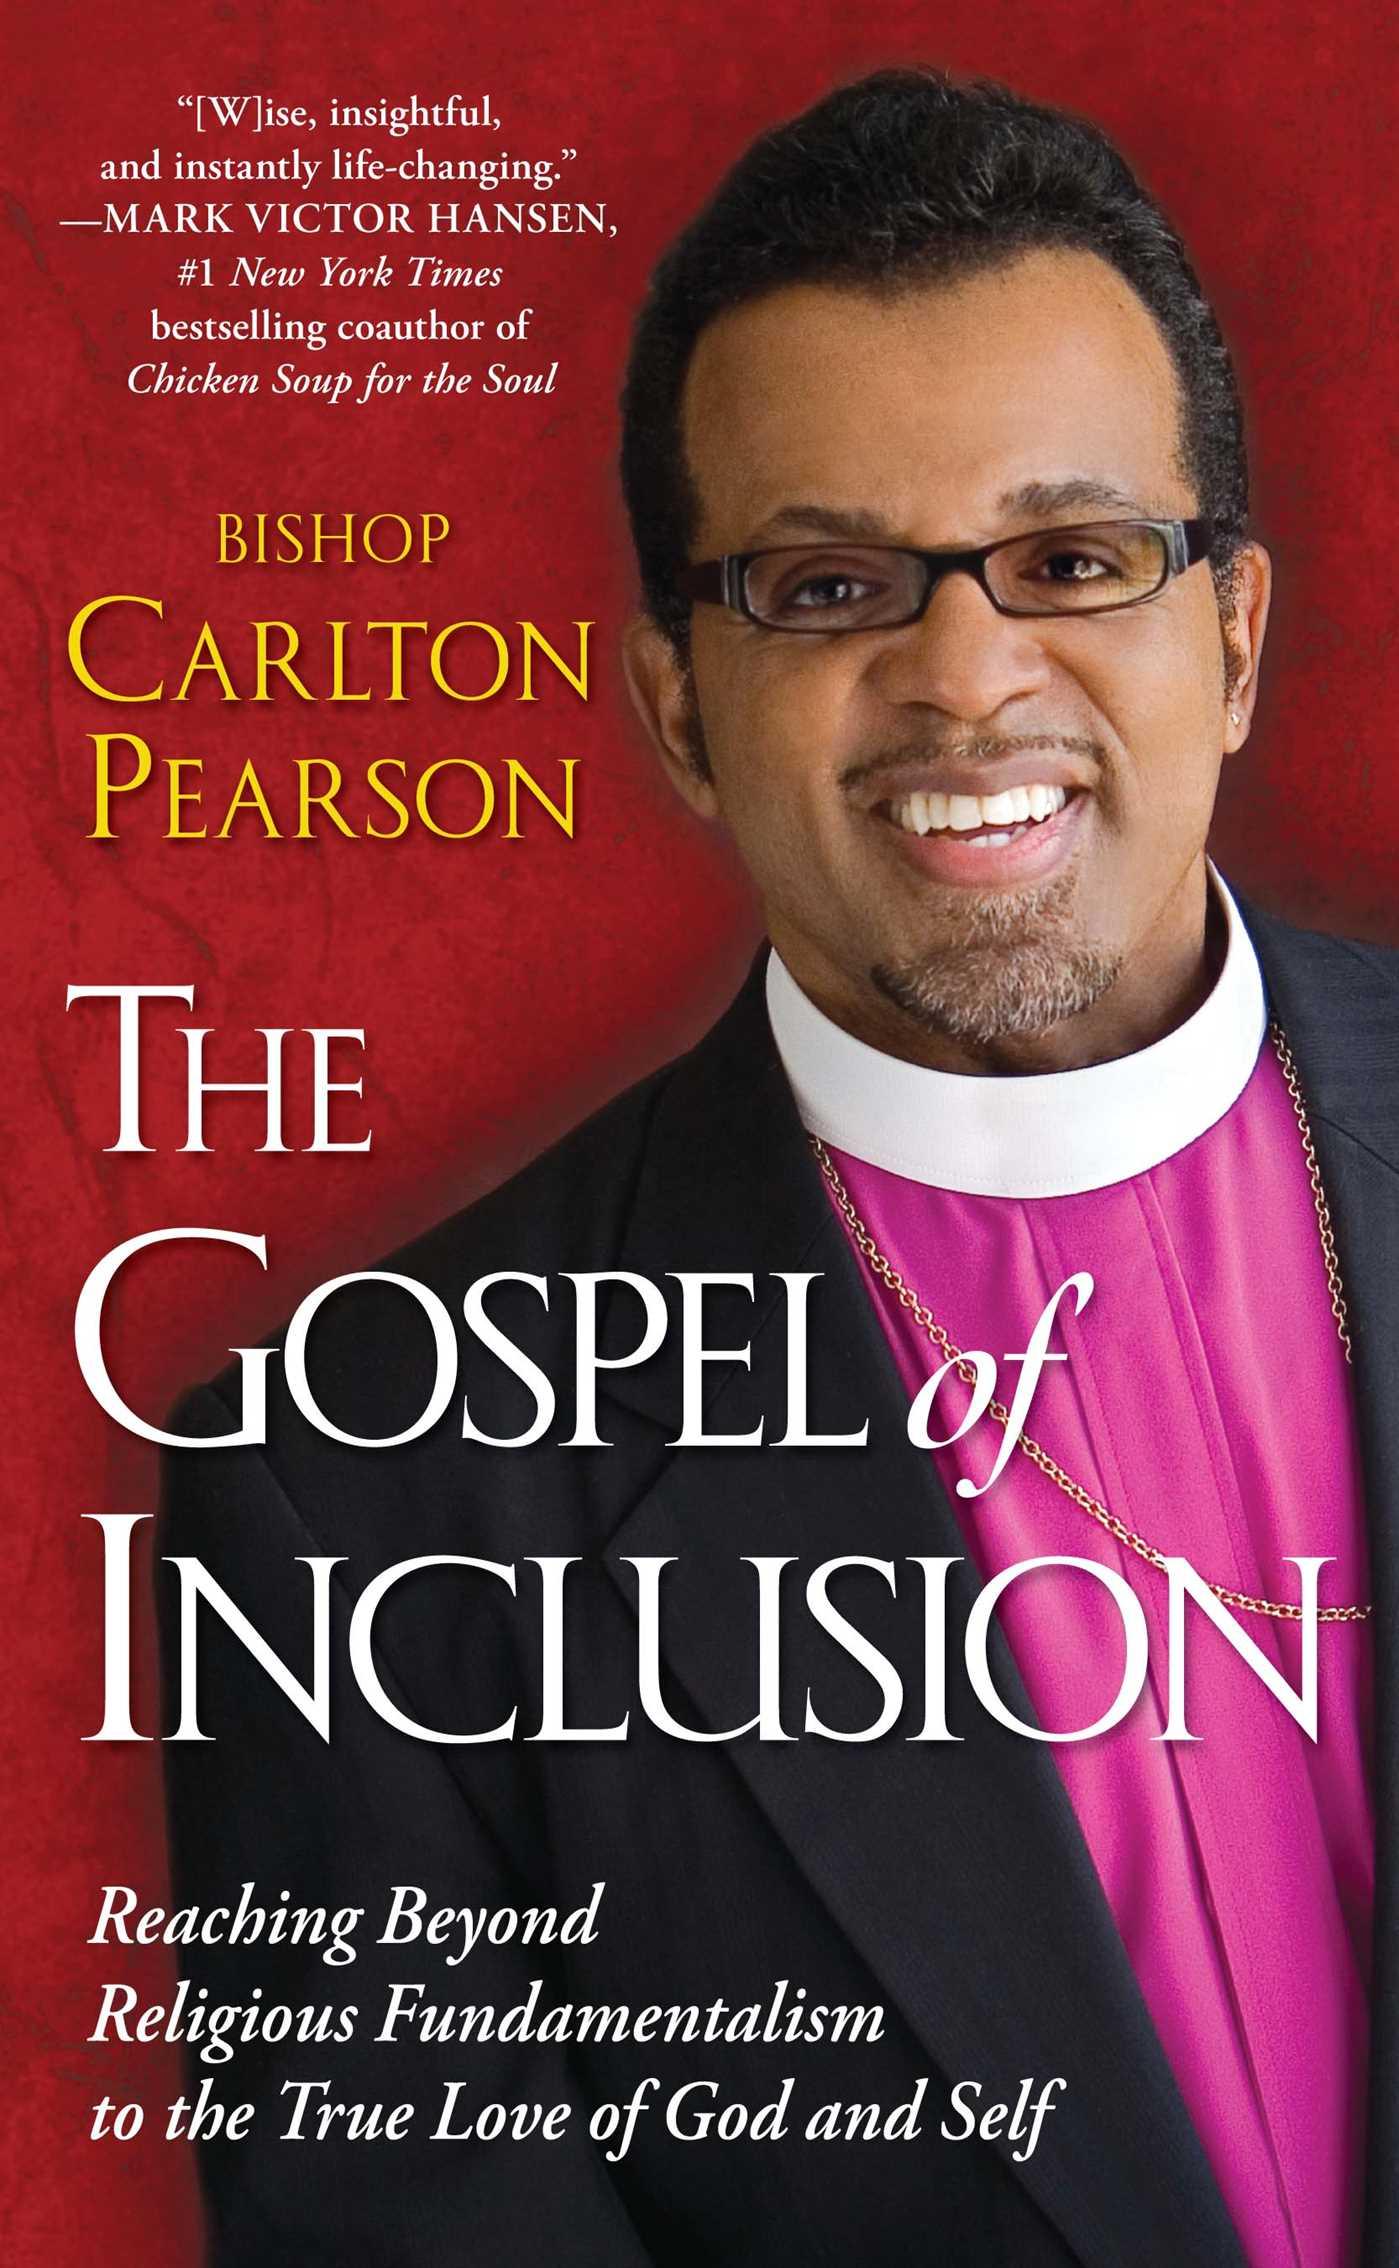 Gospel of inclusion 9781416547938 hr